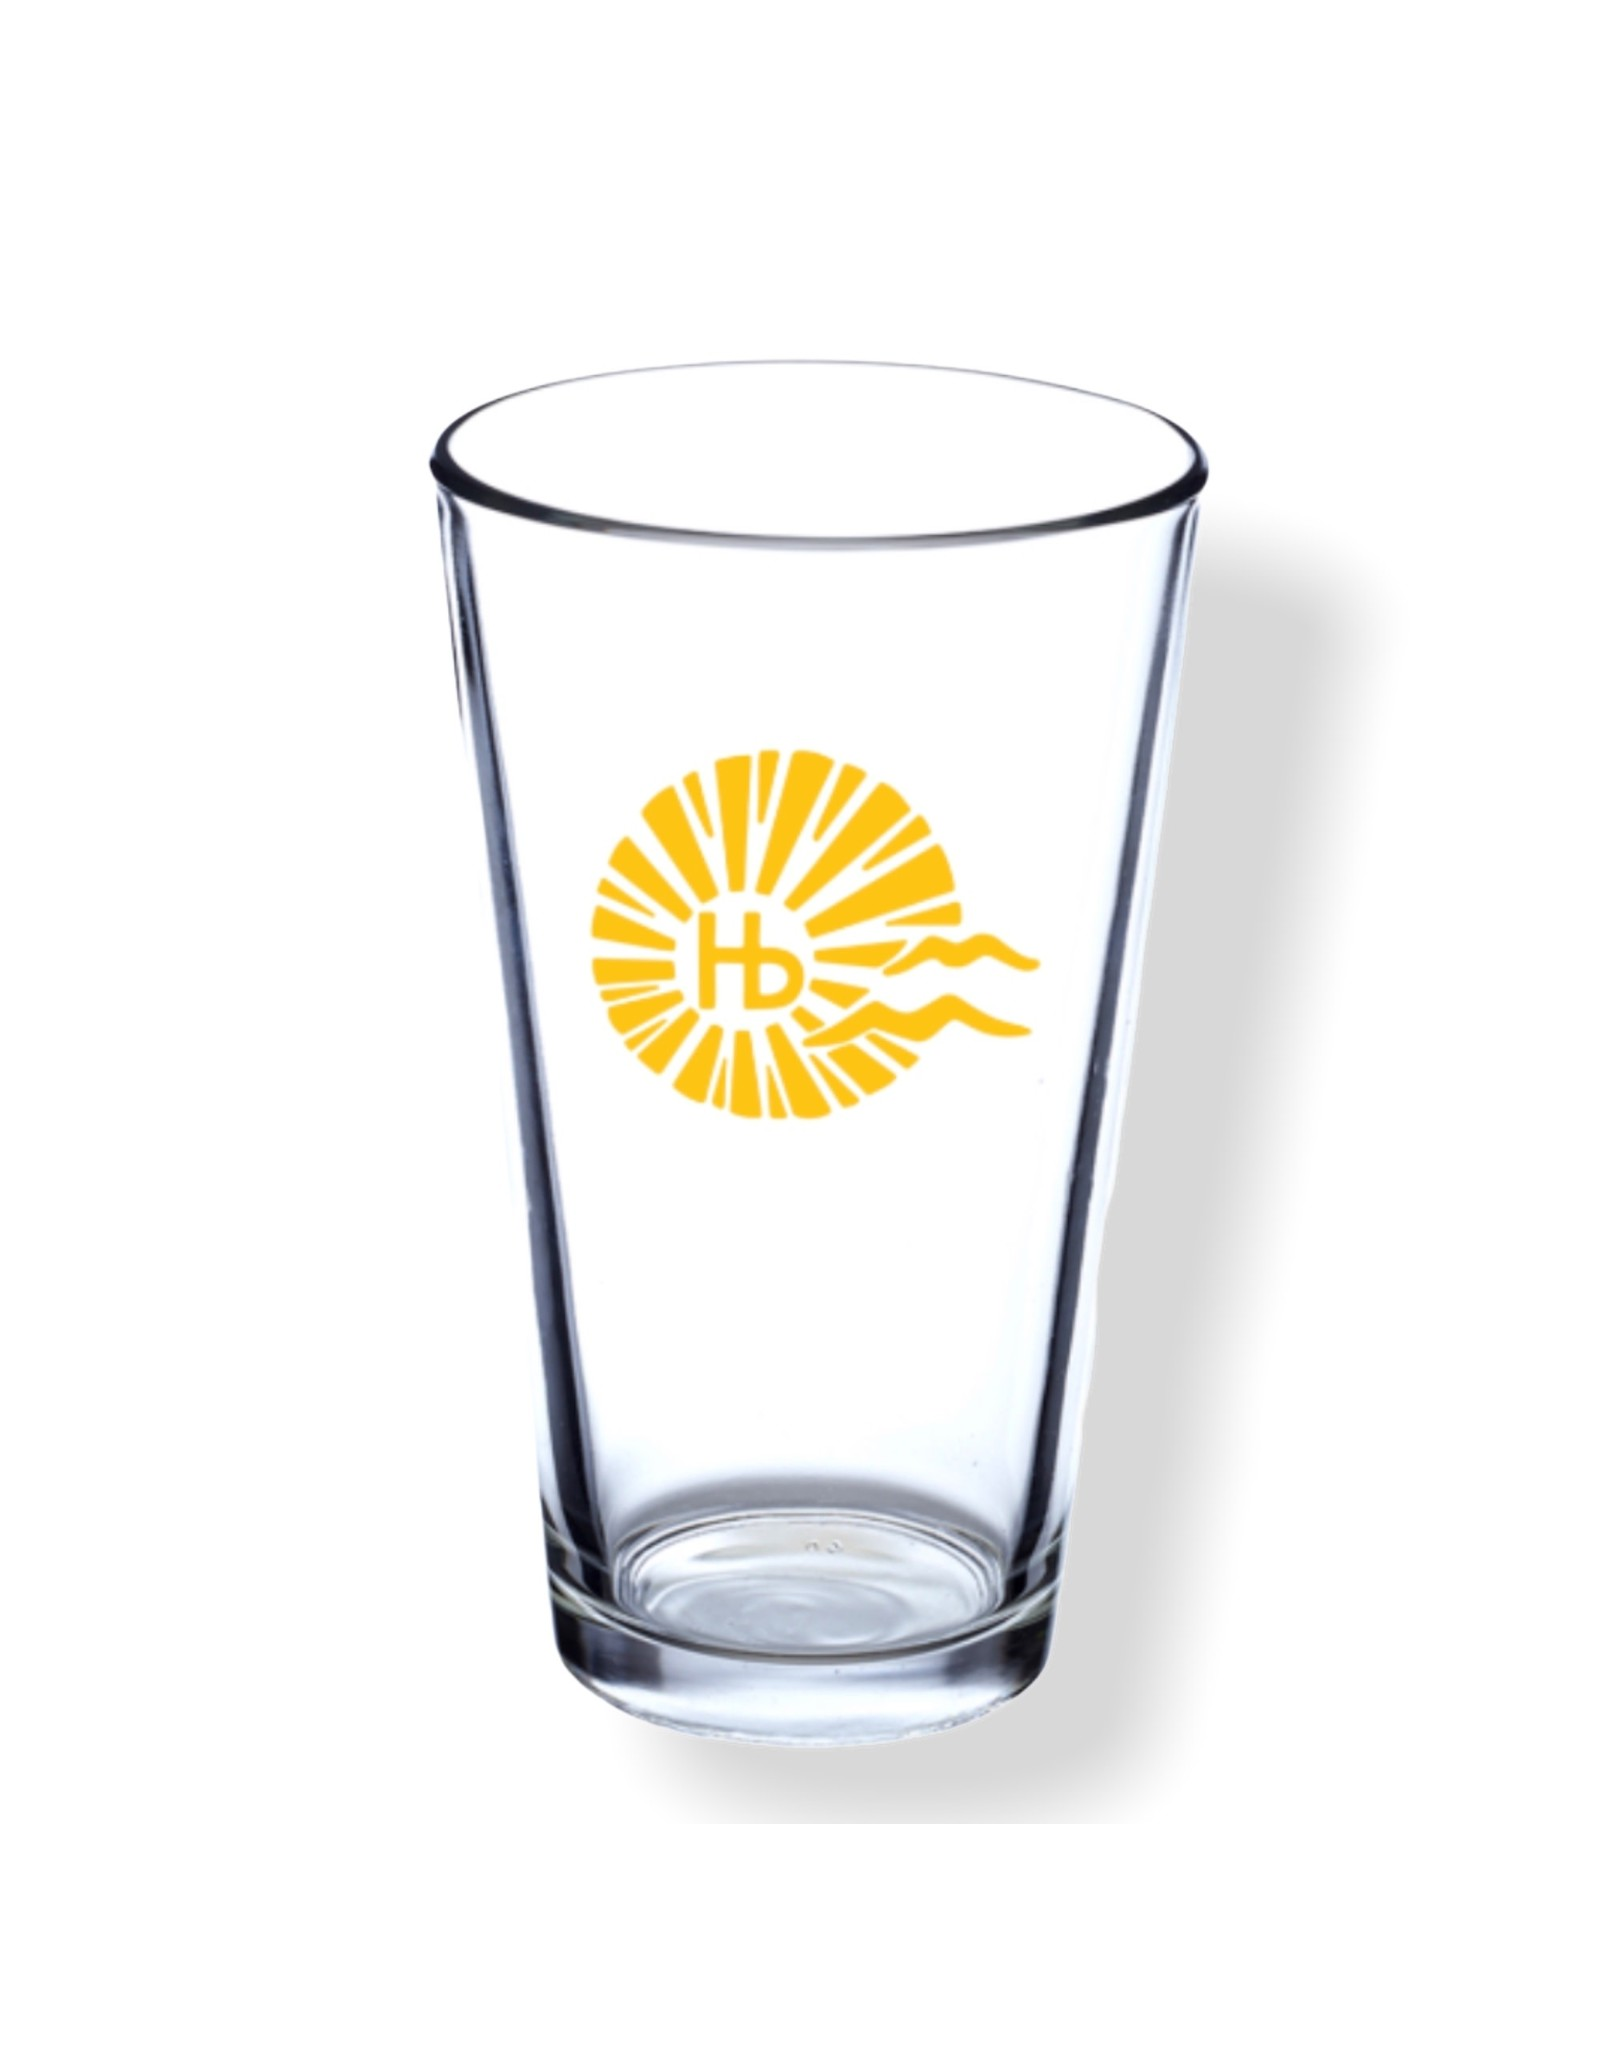 DiscountMugs HB CITY LOGO PINT GLASS